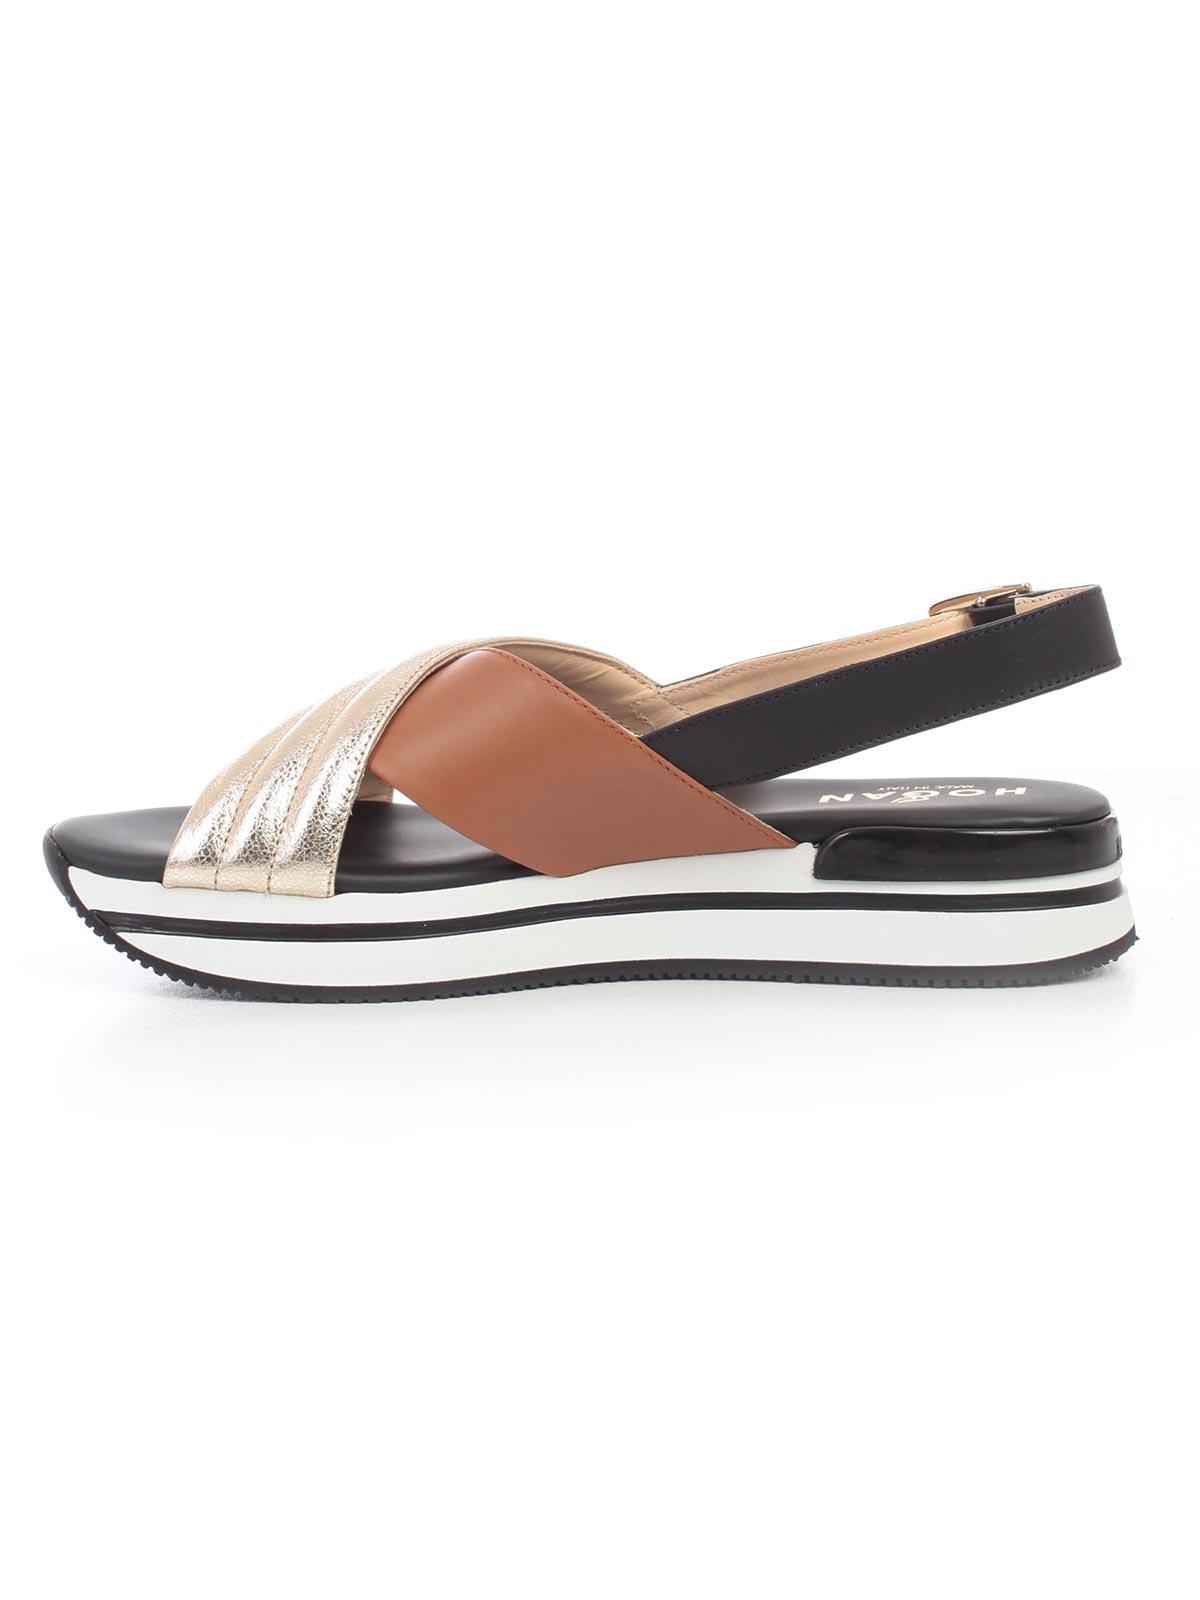 4c859daac9517 Hogan Shoes HXW2570BJ80KKVOQDQ - NERO PLATINO BISCOTTO.Bernardelli ...